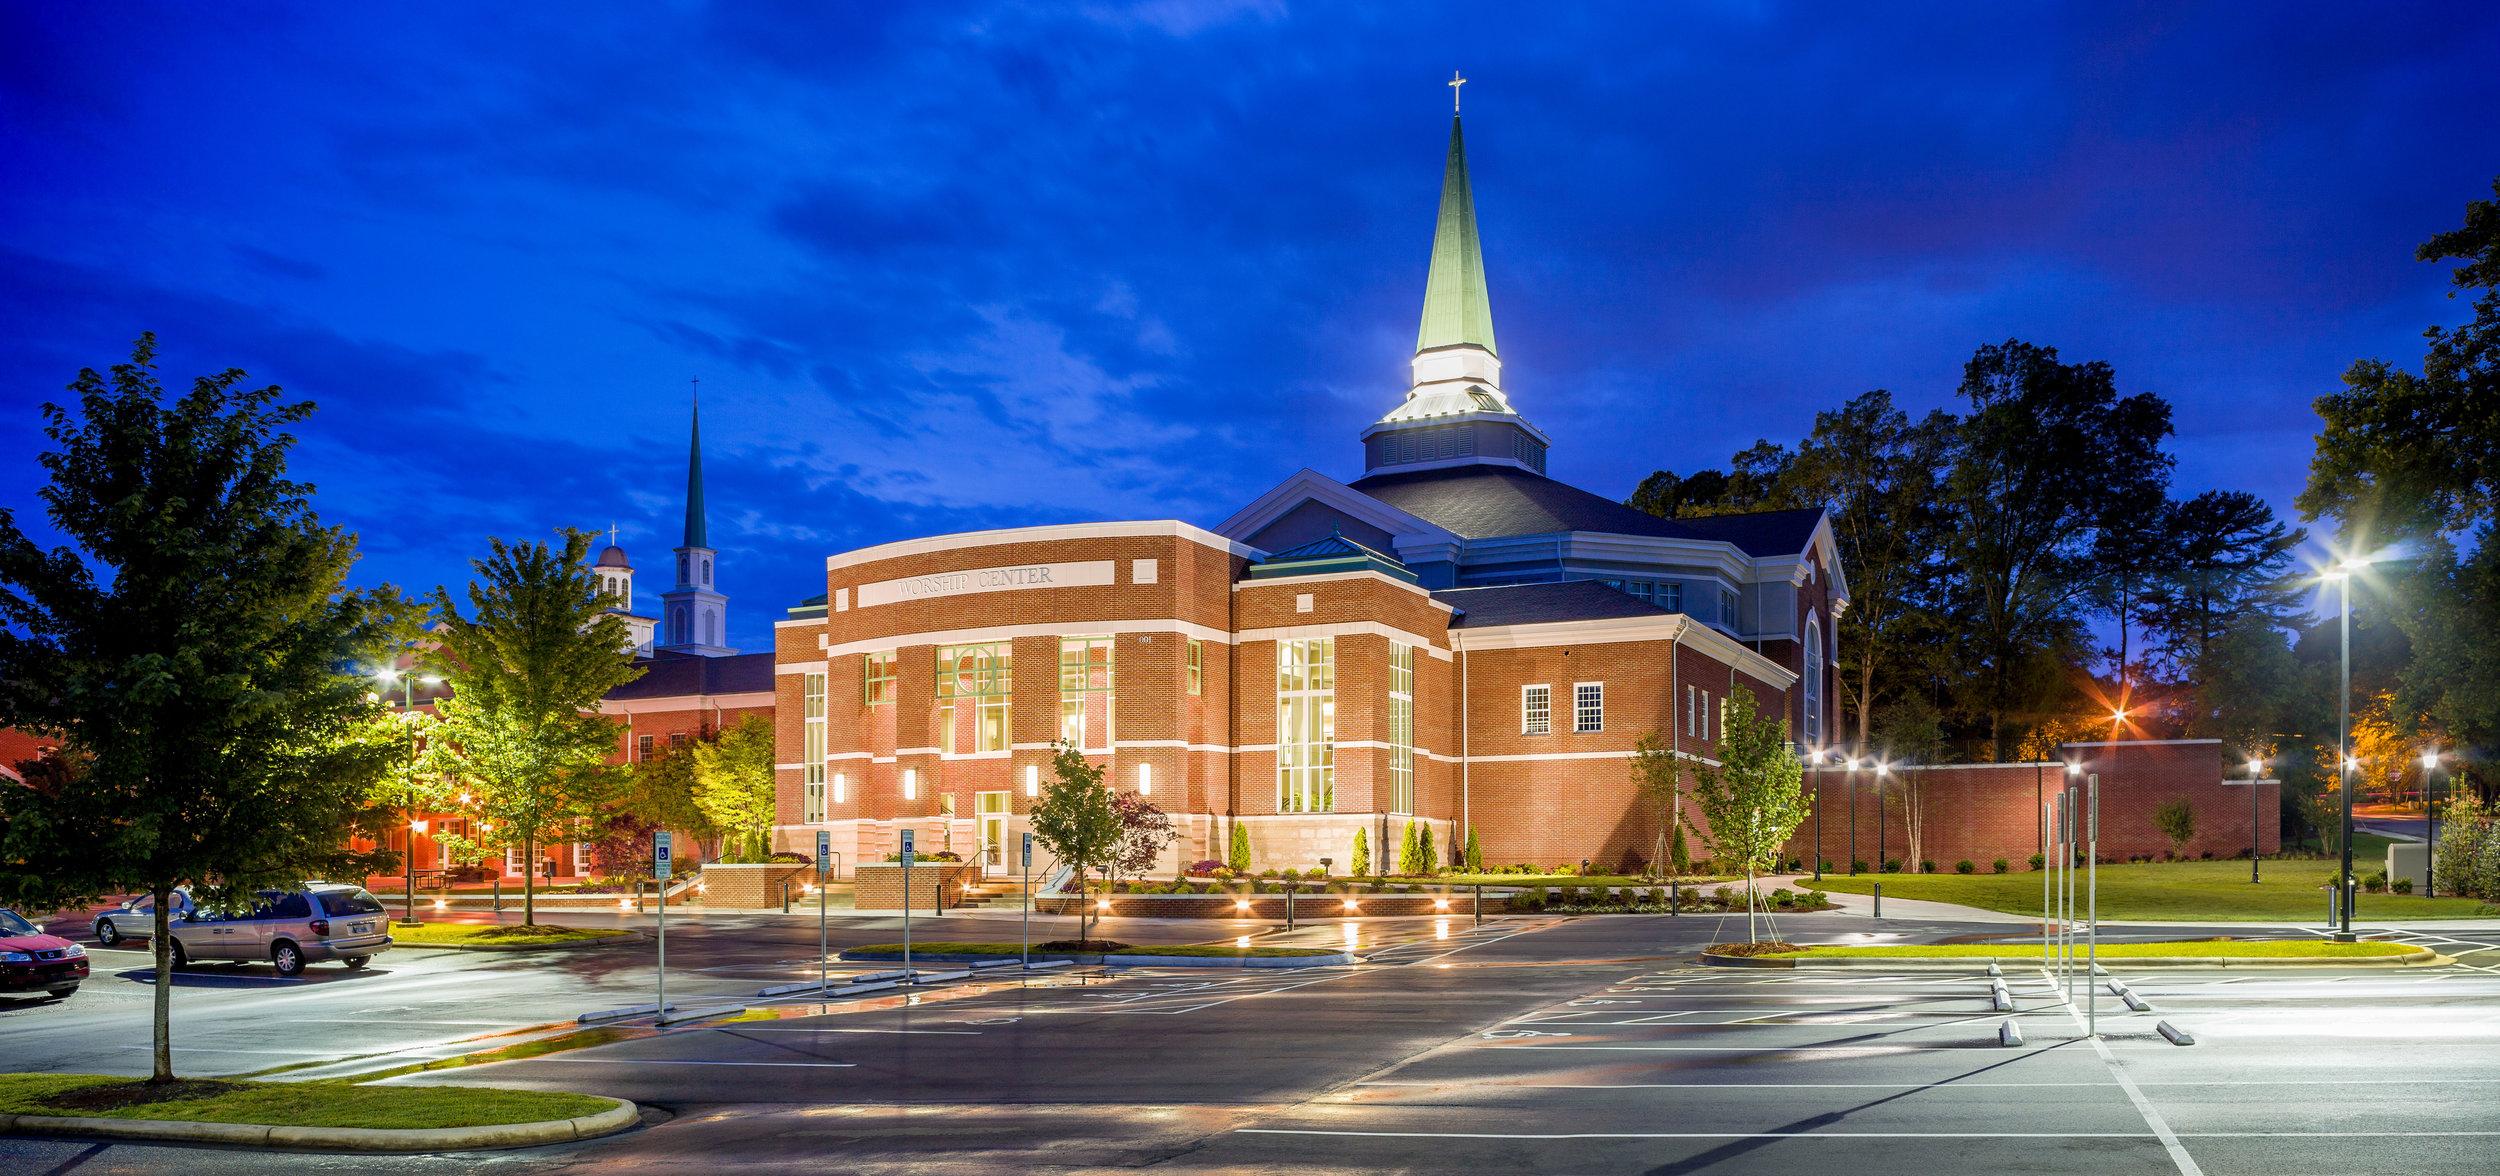 ADW-Faith-Based-Christ-Lutheran-Charlotte-NC-Exterior.jpg